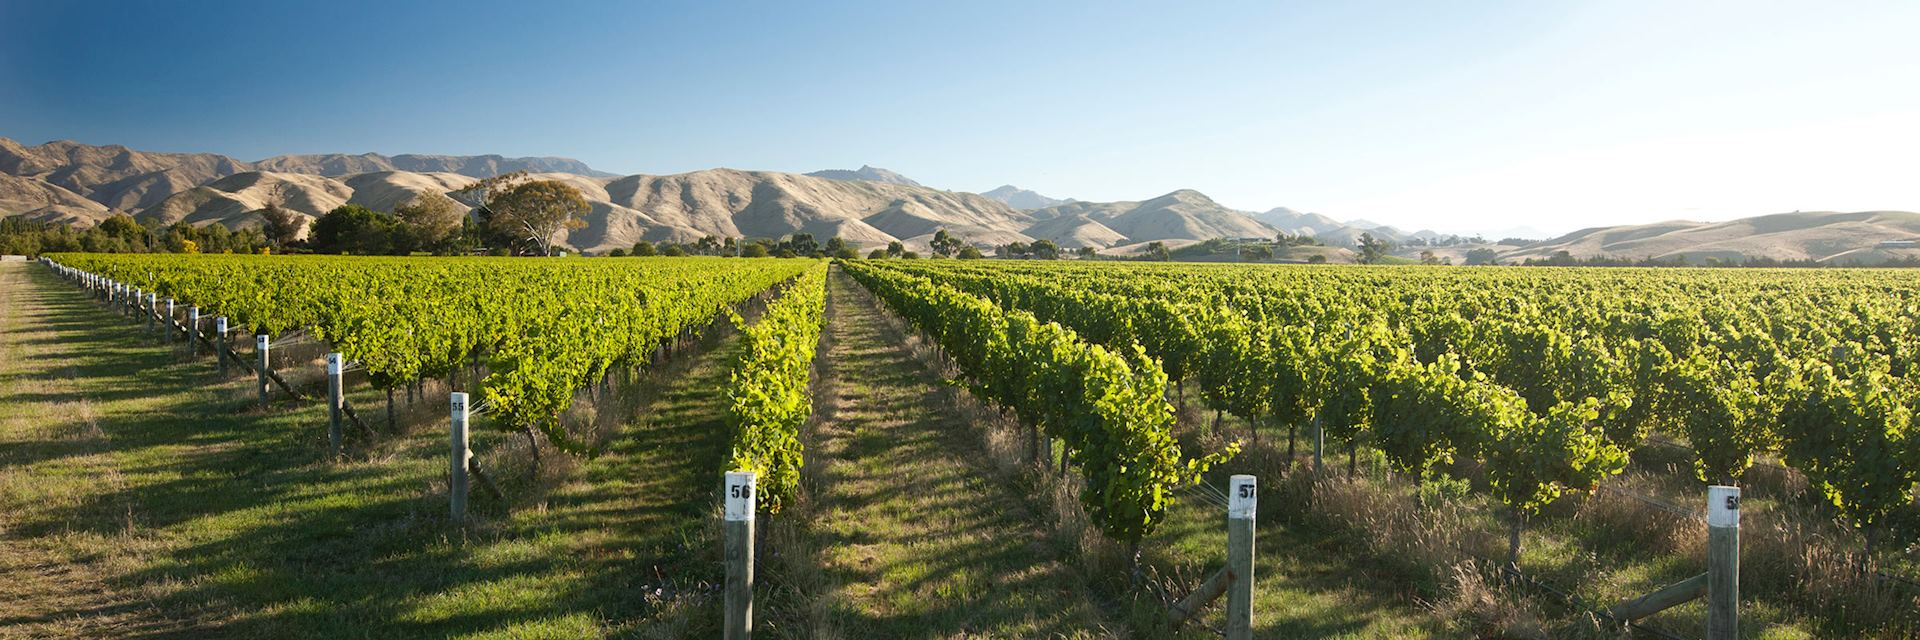 Vineyard in Marlborough, New Zealand